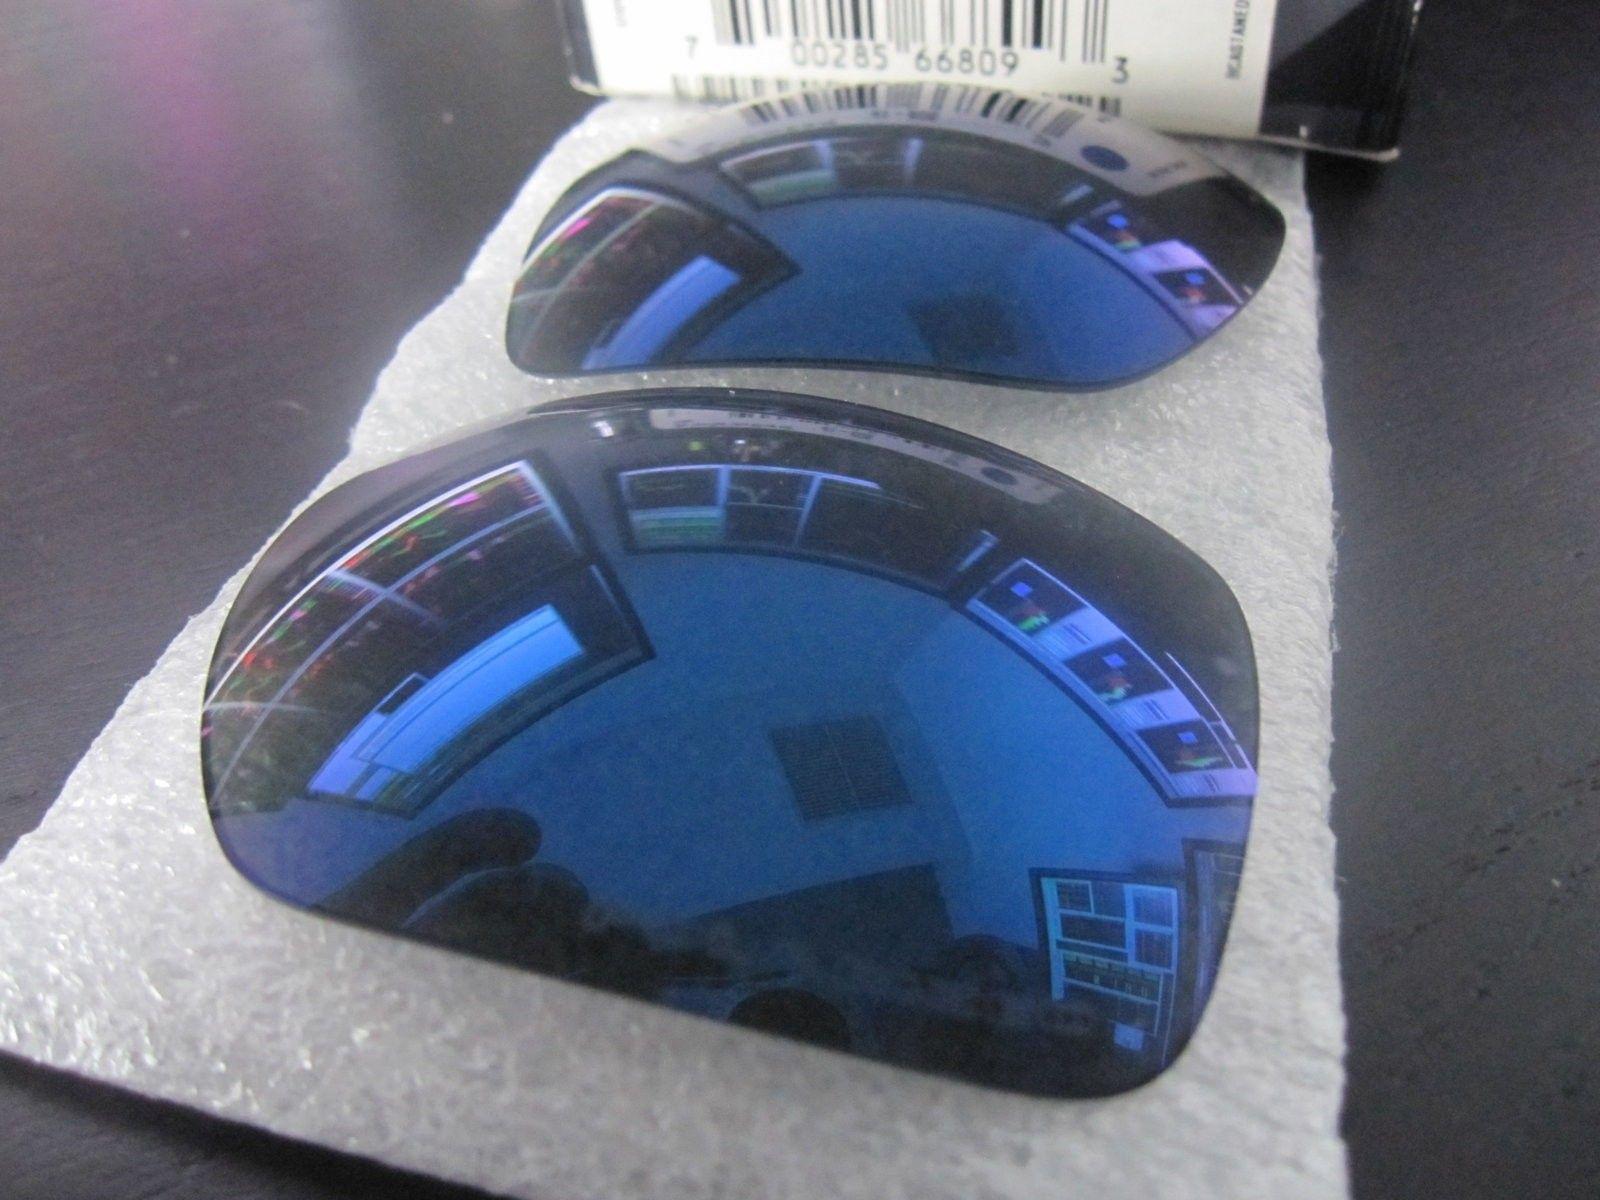 BNIB Big Taco Ice Polarized lenses - SKU 41-806 - Donors for X-Metals - IMG_5446.JPG